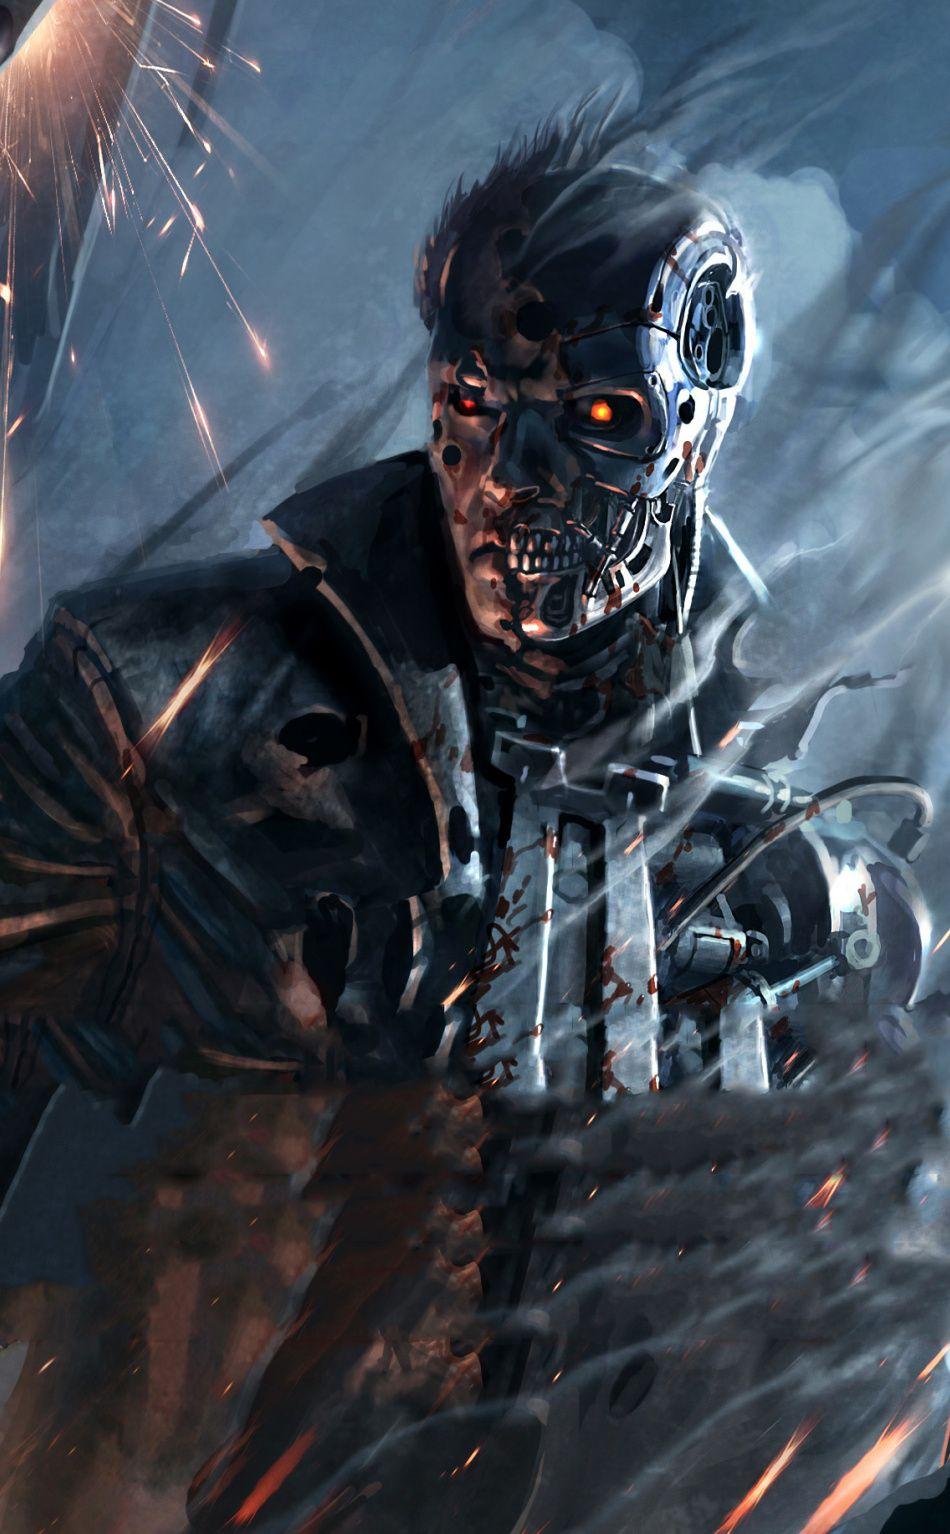 Download 950x1534 wallpaper Terminator Resistance action game 950x1534